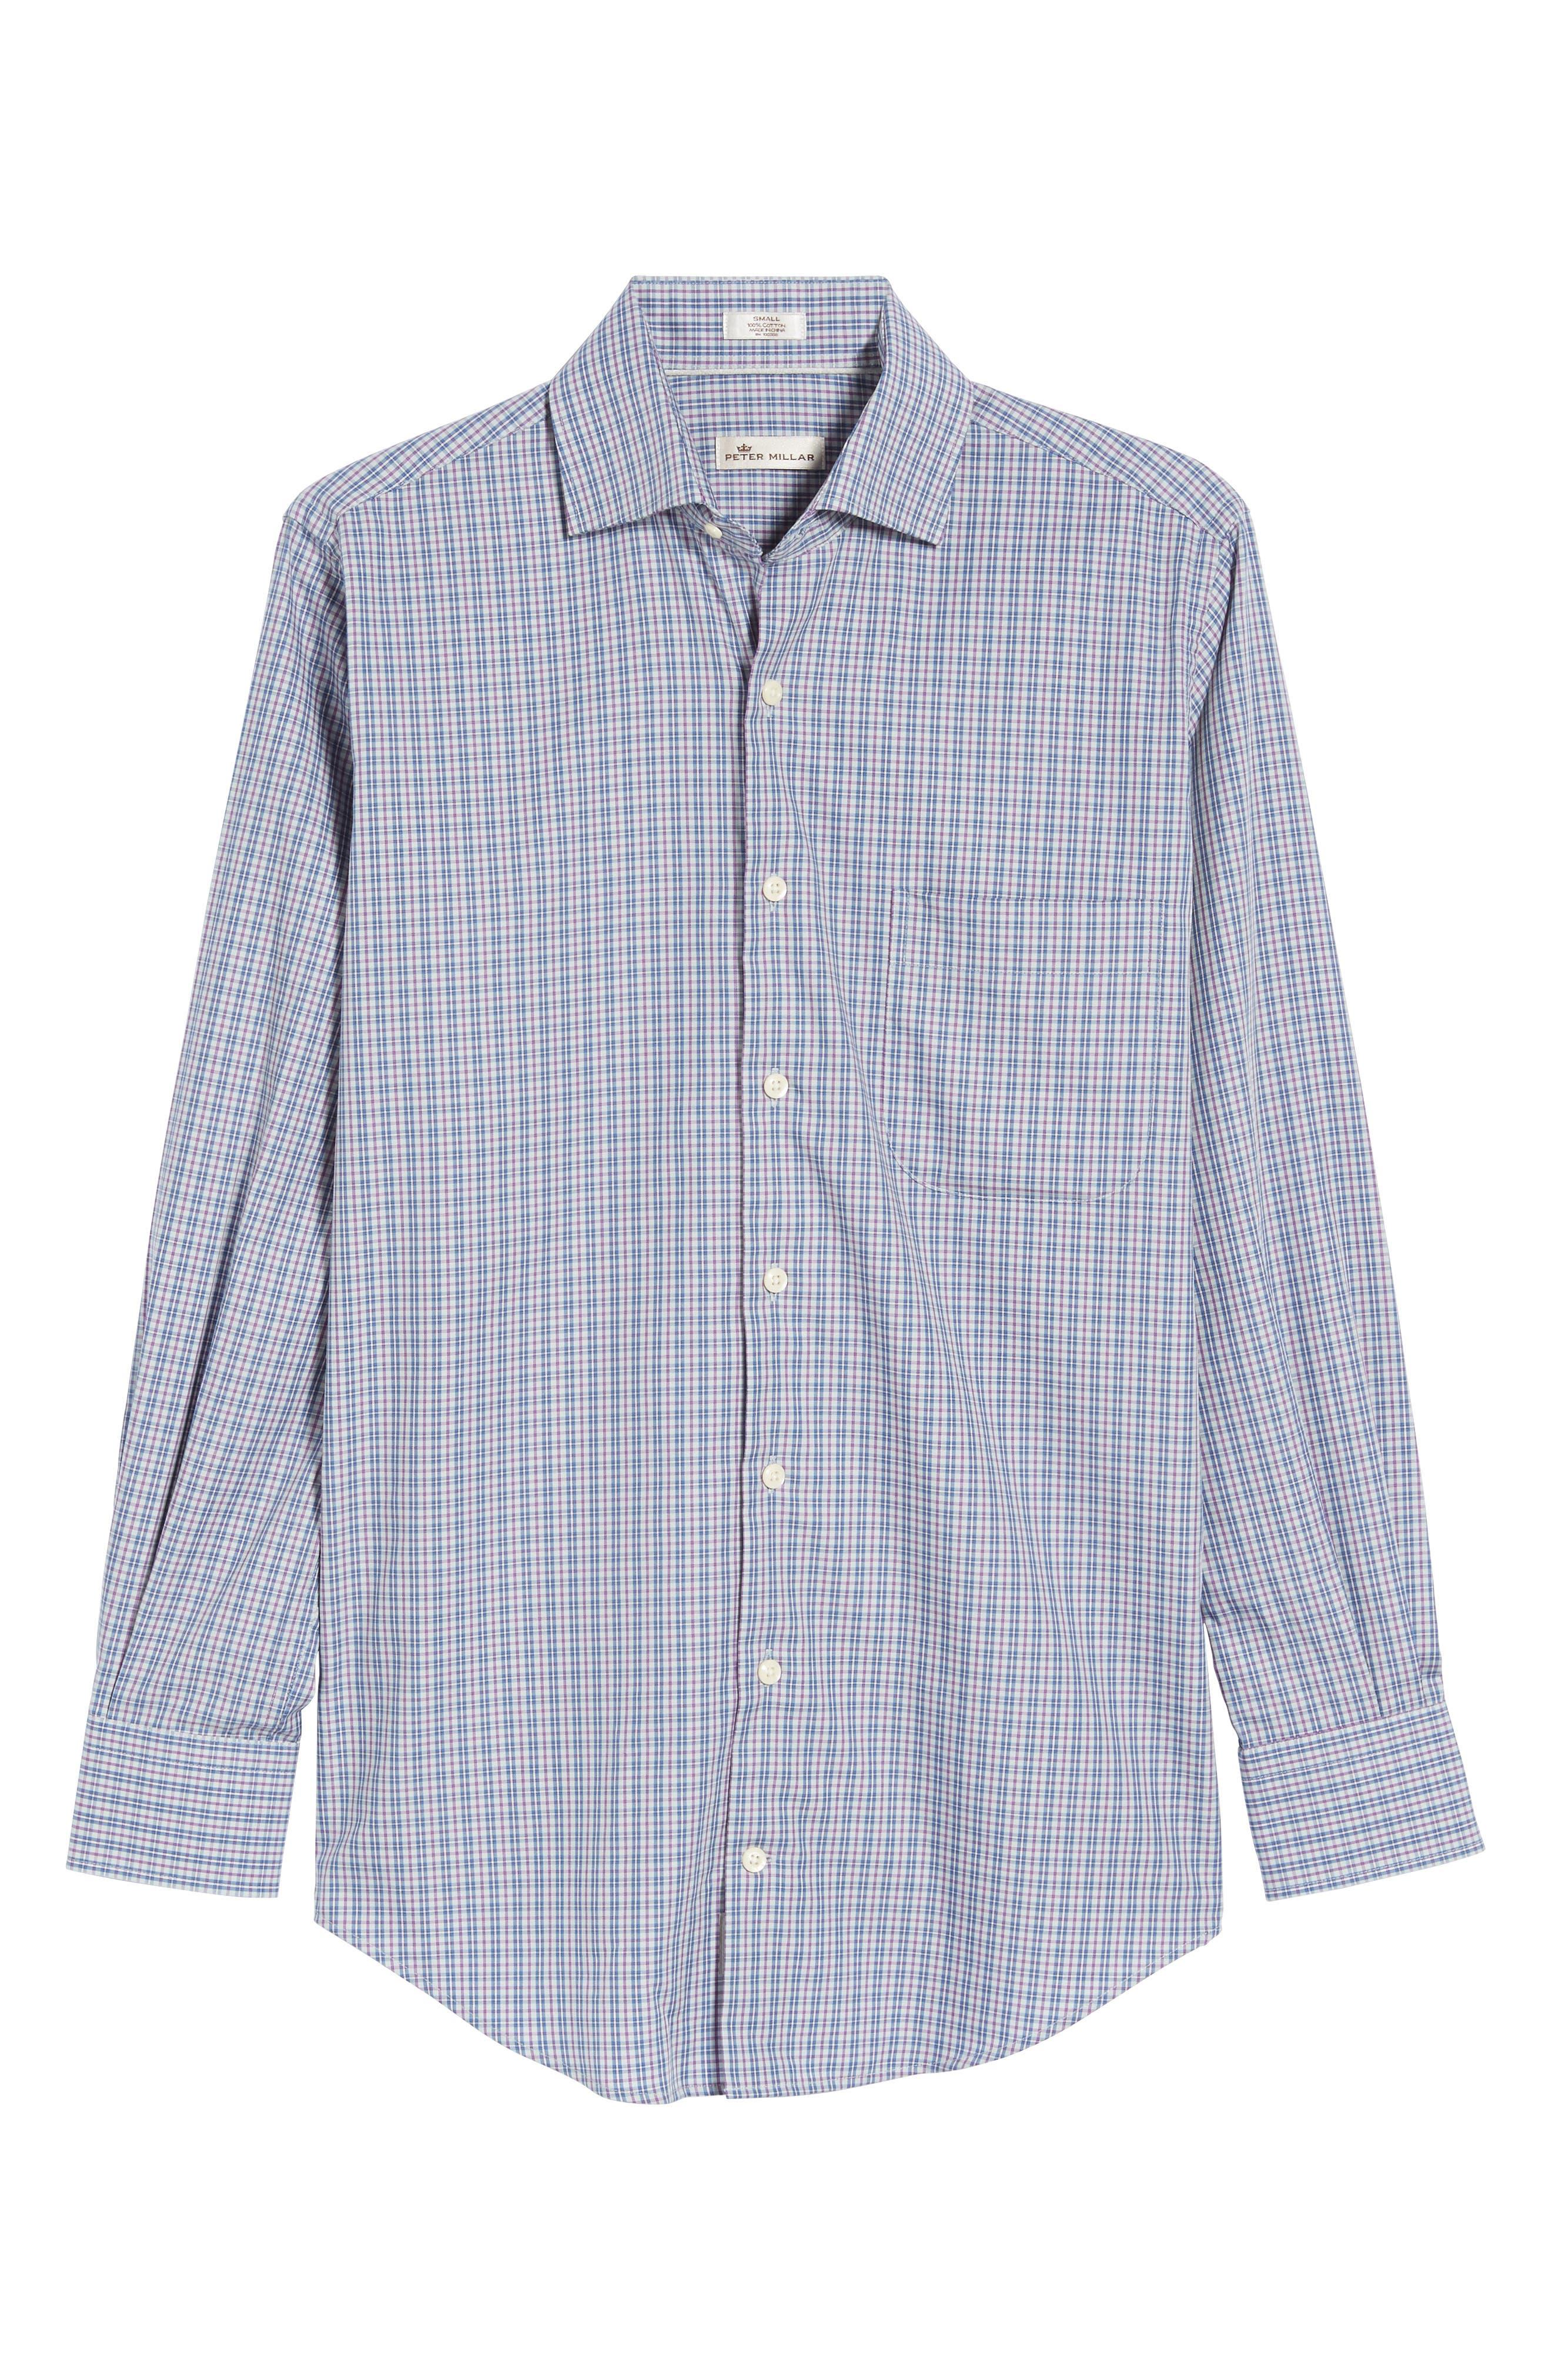 Alternate Image 6  - Peter Millar Hillock Plaid Regular Fit Sport Shirt